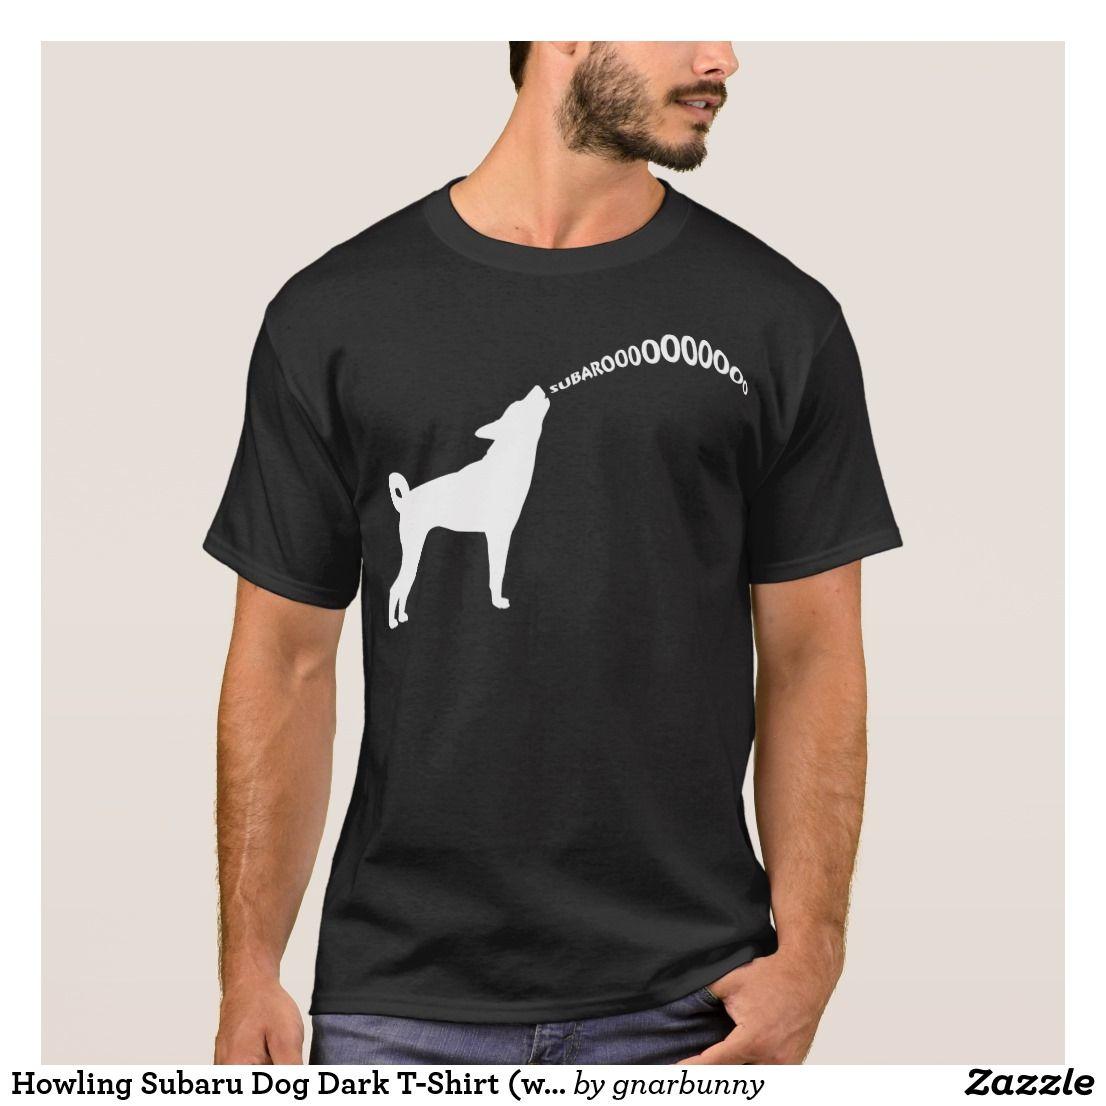 Design t shirt zazzle - Howling Subaru Dog Dark T Shirt White Design On Zazzle Zazzle Dogs Dog Tshirt Tee Shirt Clothes Fashion Style Buy Shop Shopping Products